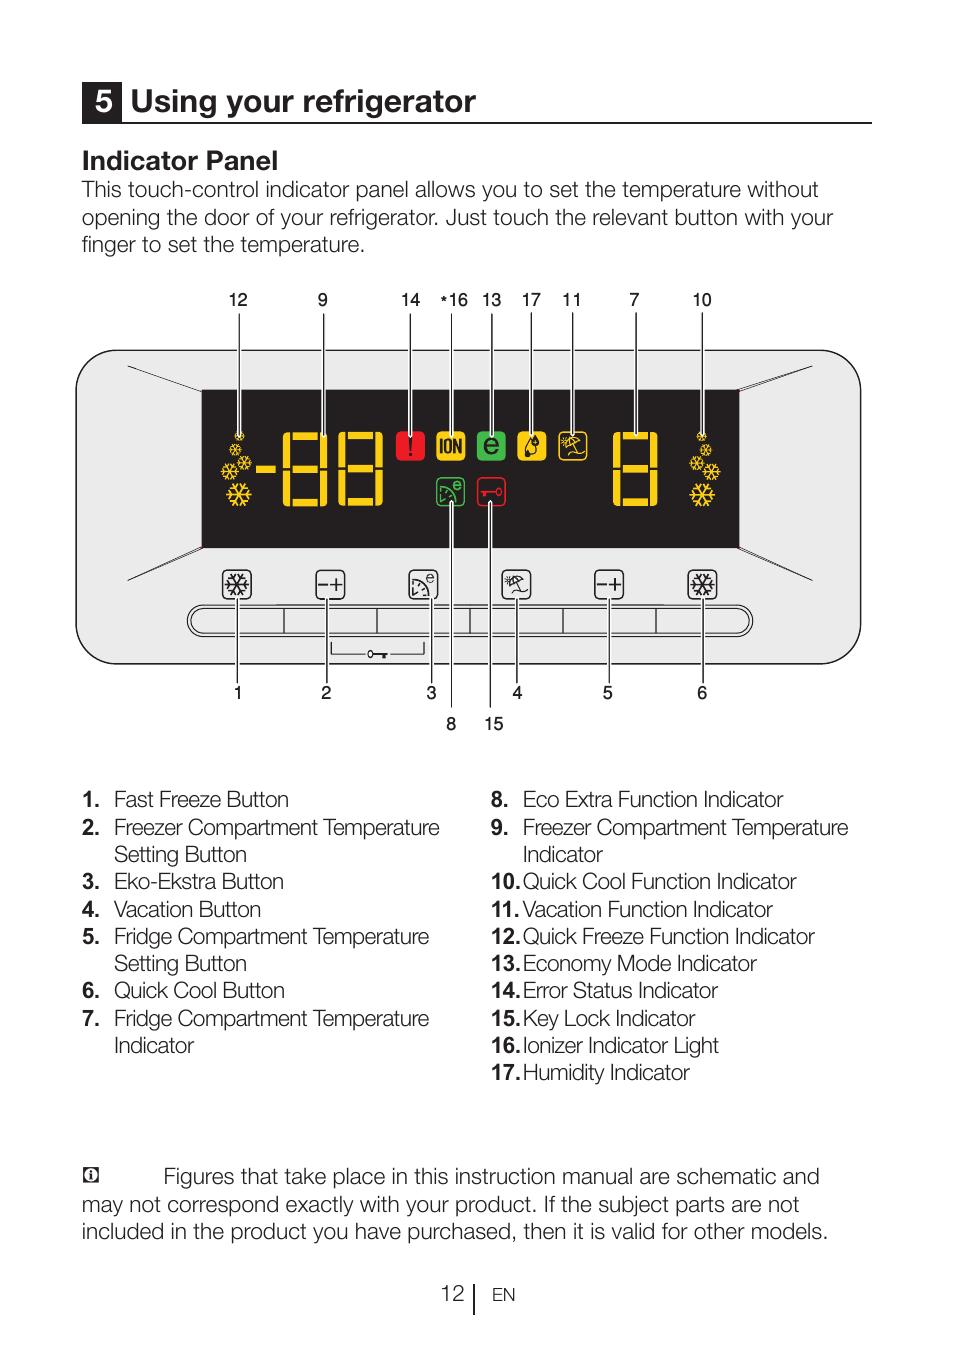 5using your refrigerator indicator panel blomberg knd 9950 x a rh manualsdir com blomberg dishwasher manual seit 1883 Blomberg Kitchens